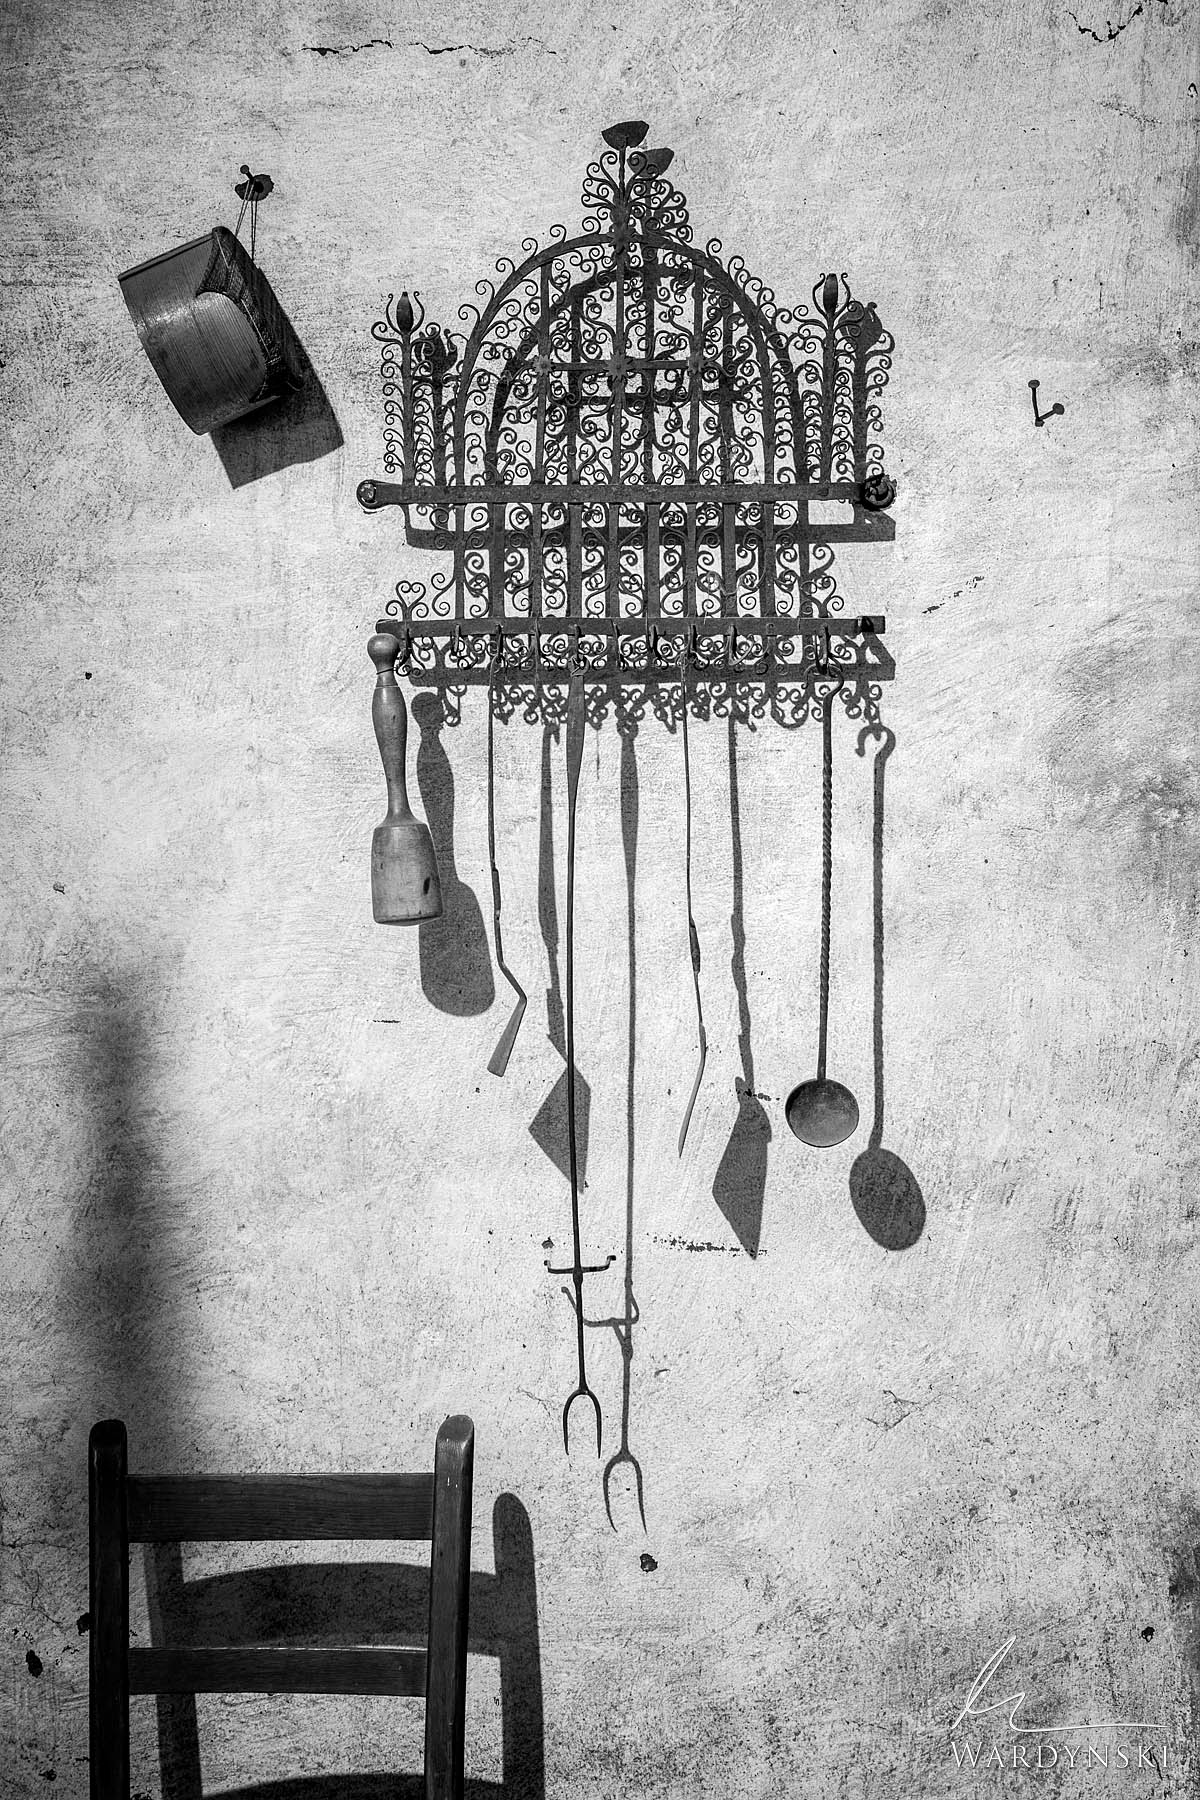 vertical, still life, black and white,